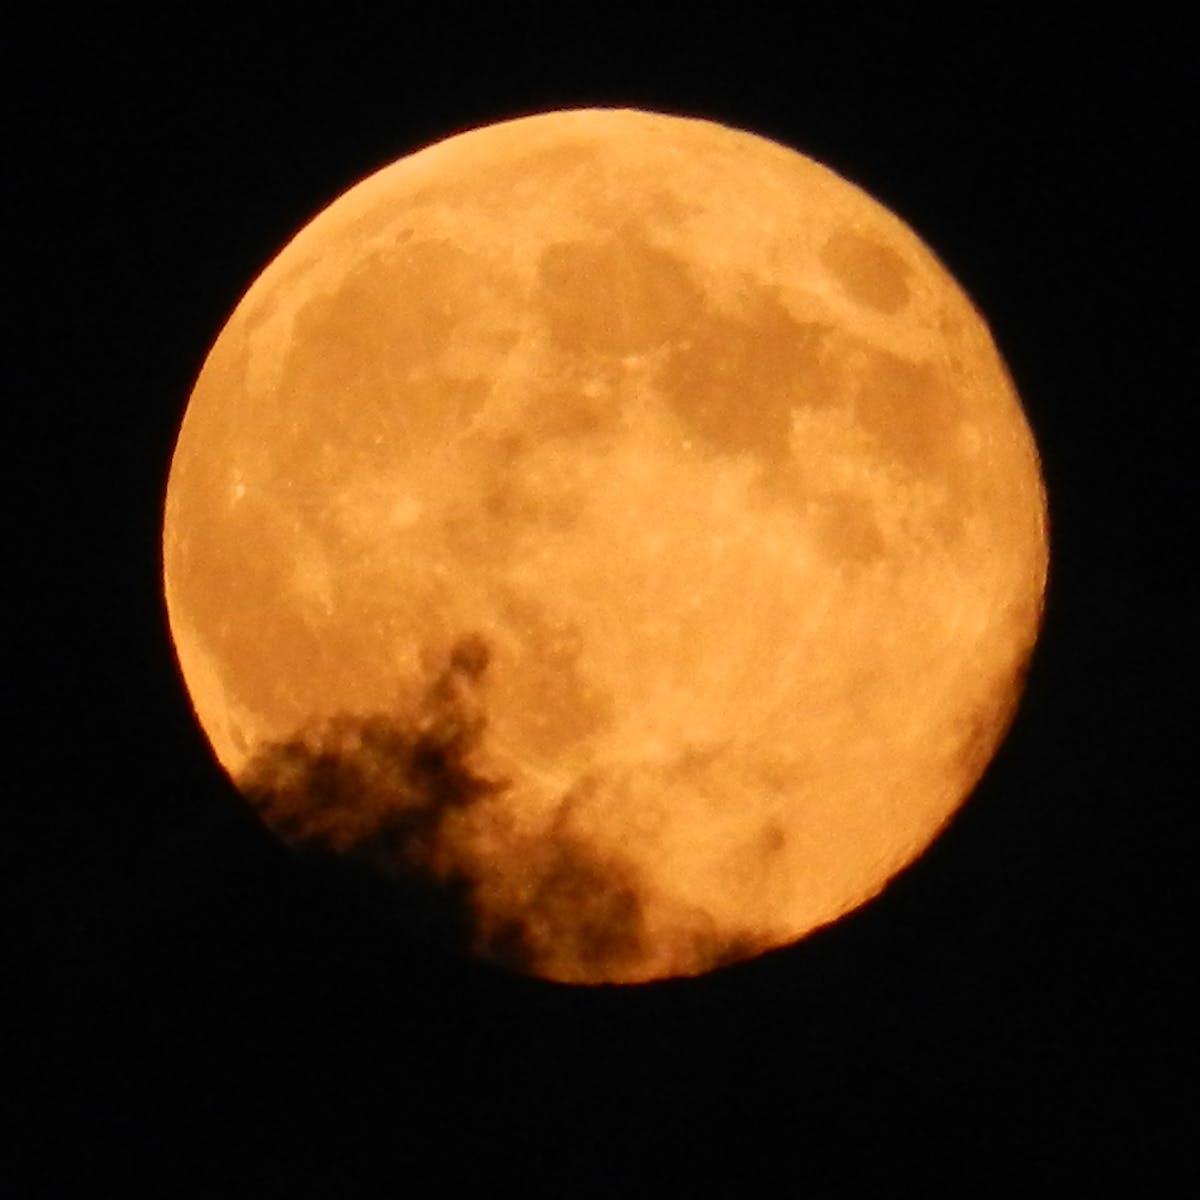 Tonight's Full Moon Falls on the Spookiest Night in 13 Years